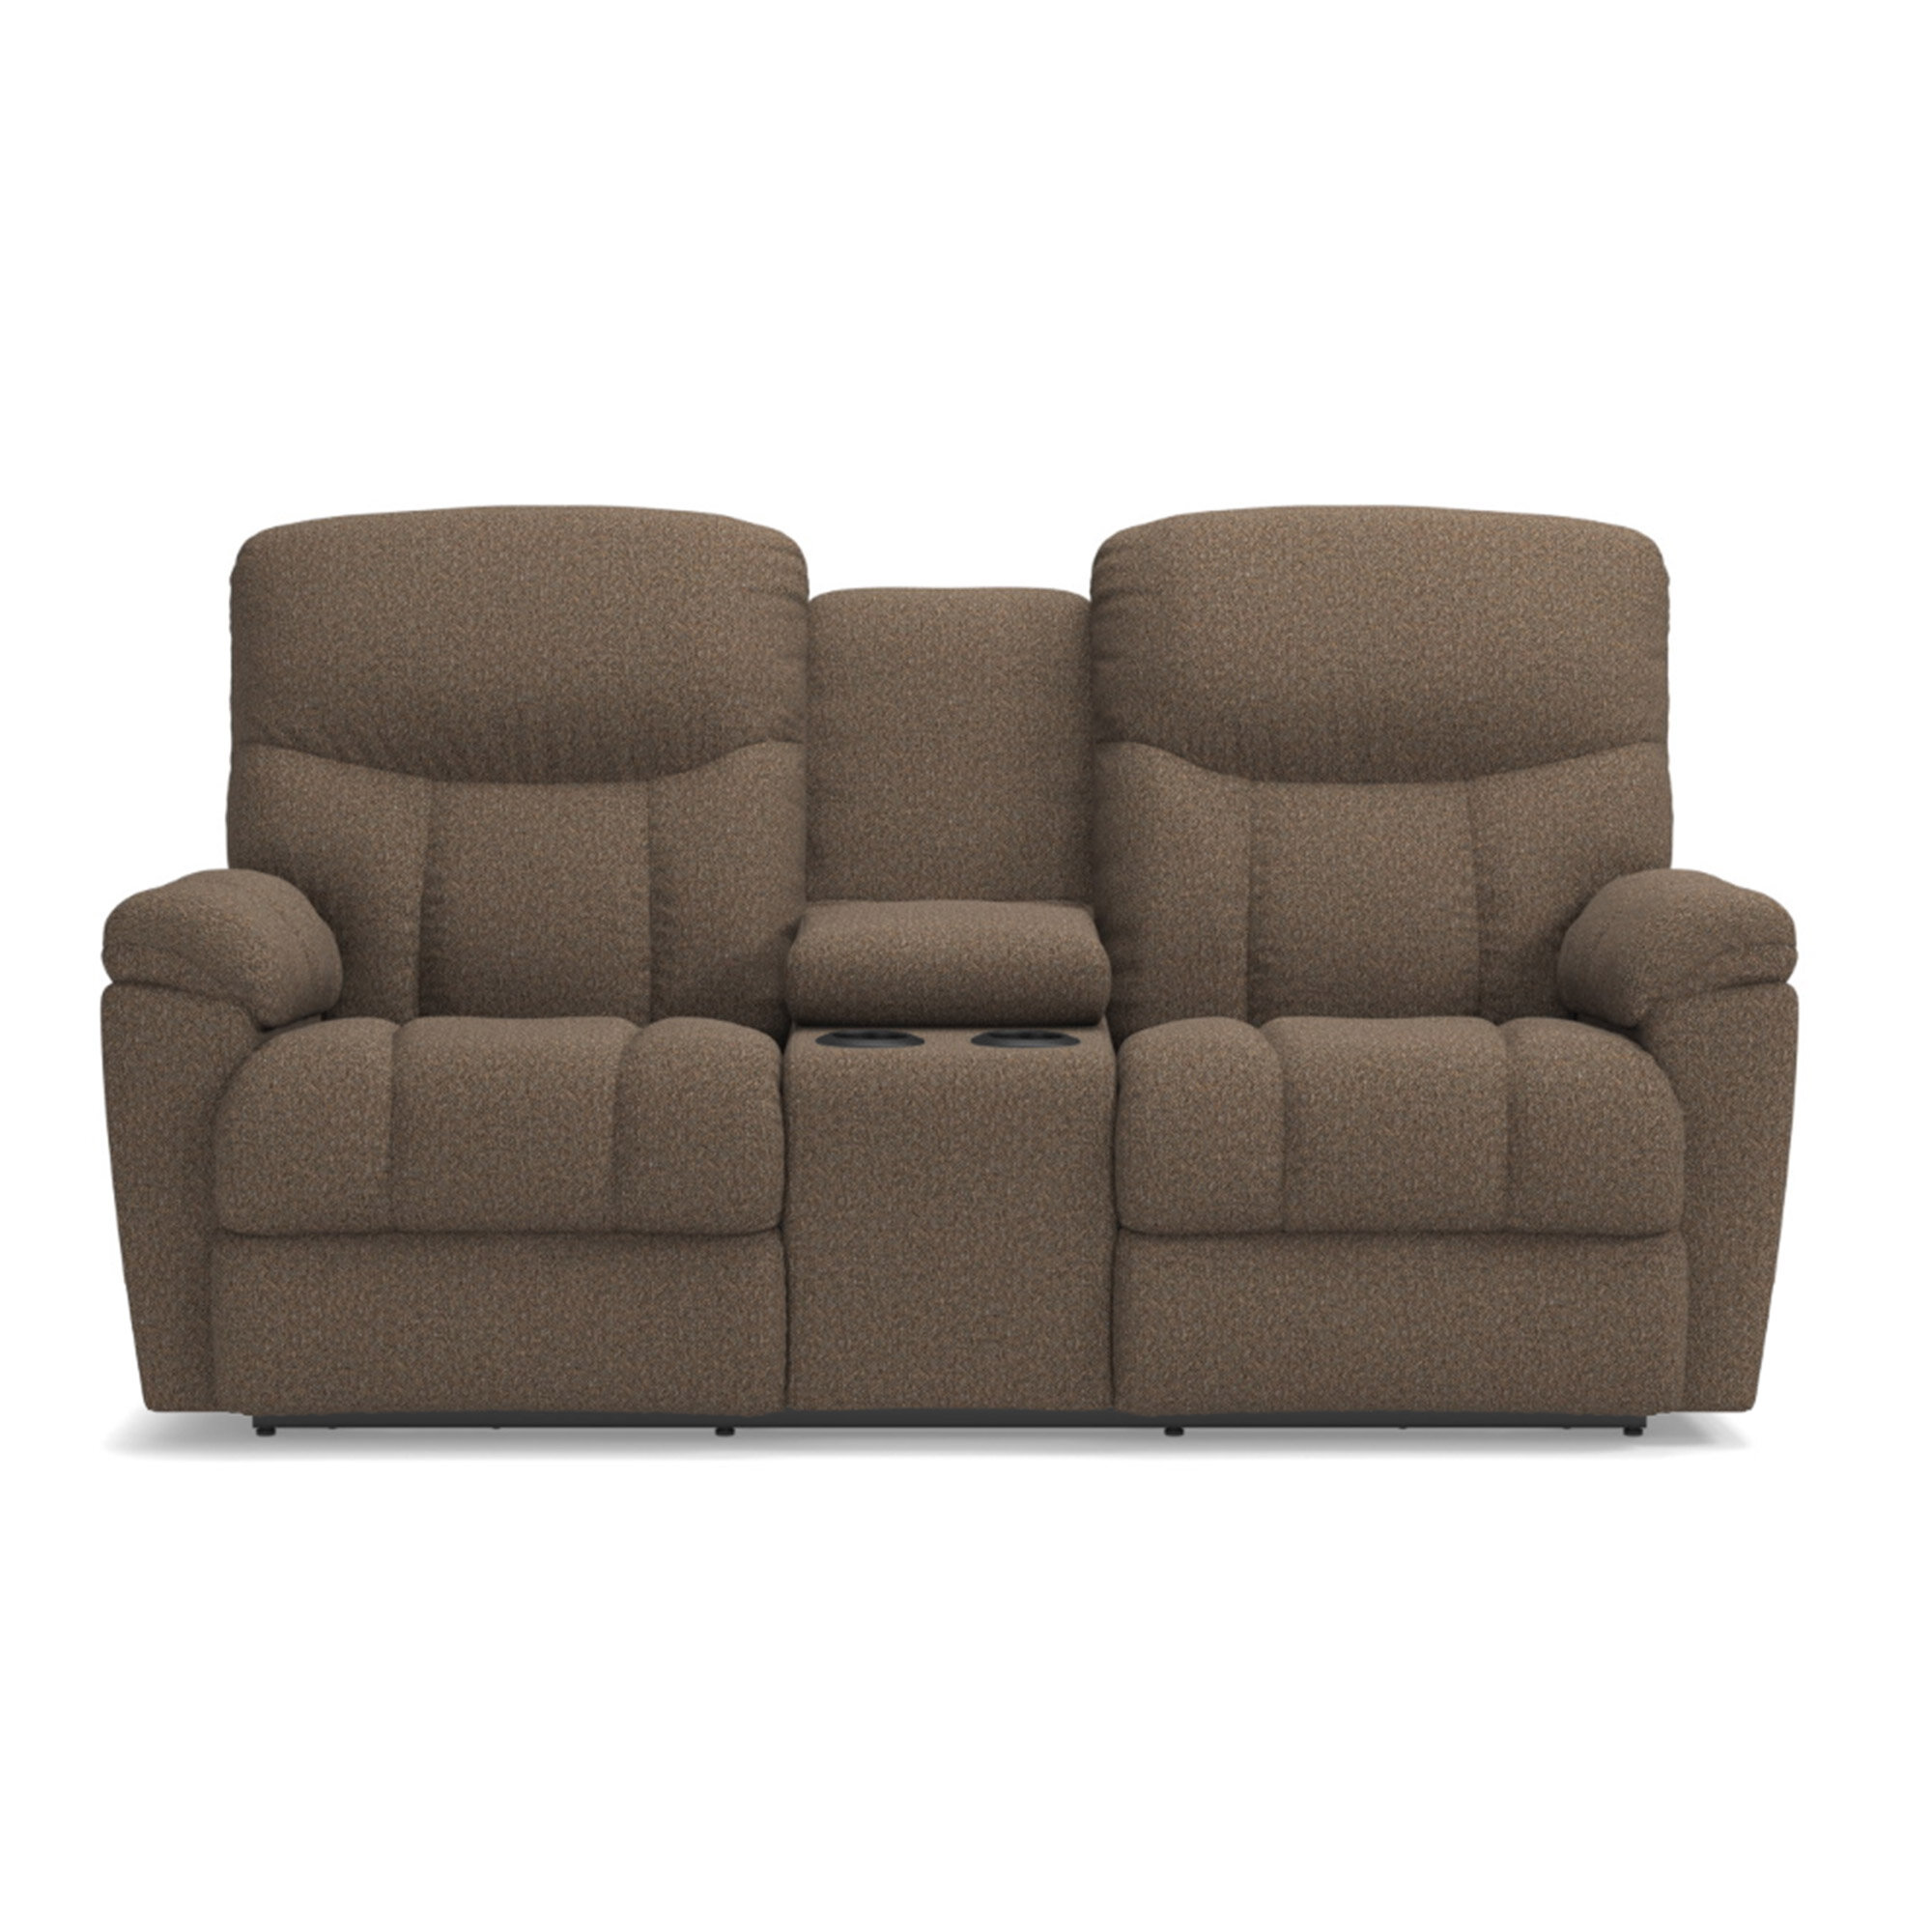 La Z Boy 78 5 Wide Pillow Top Arm Reclining Sofa Wayfair